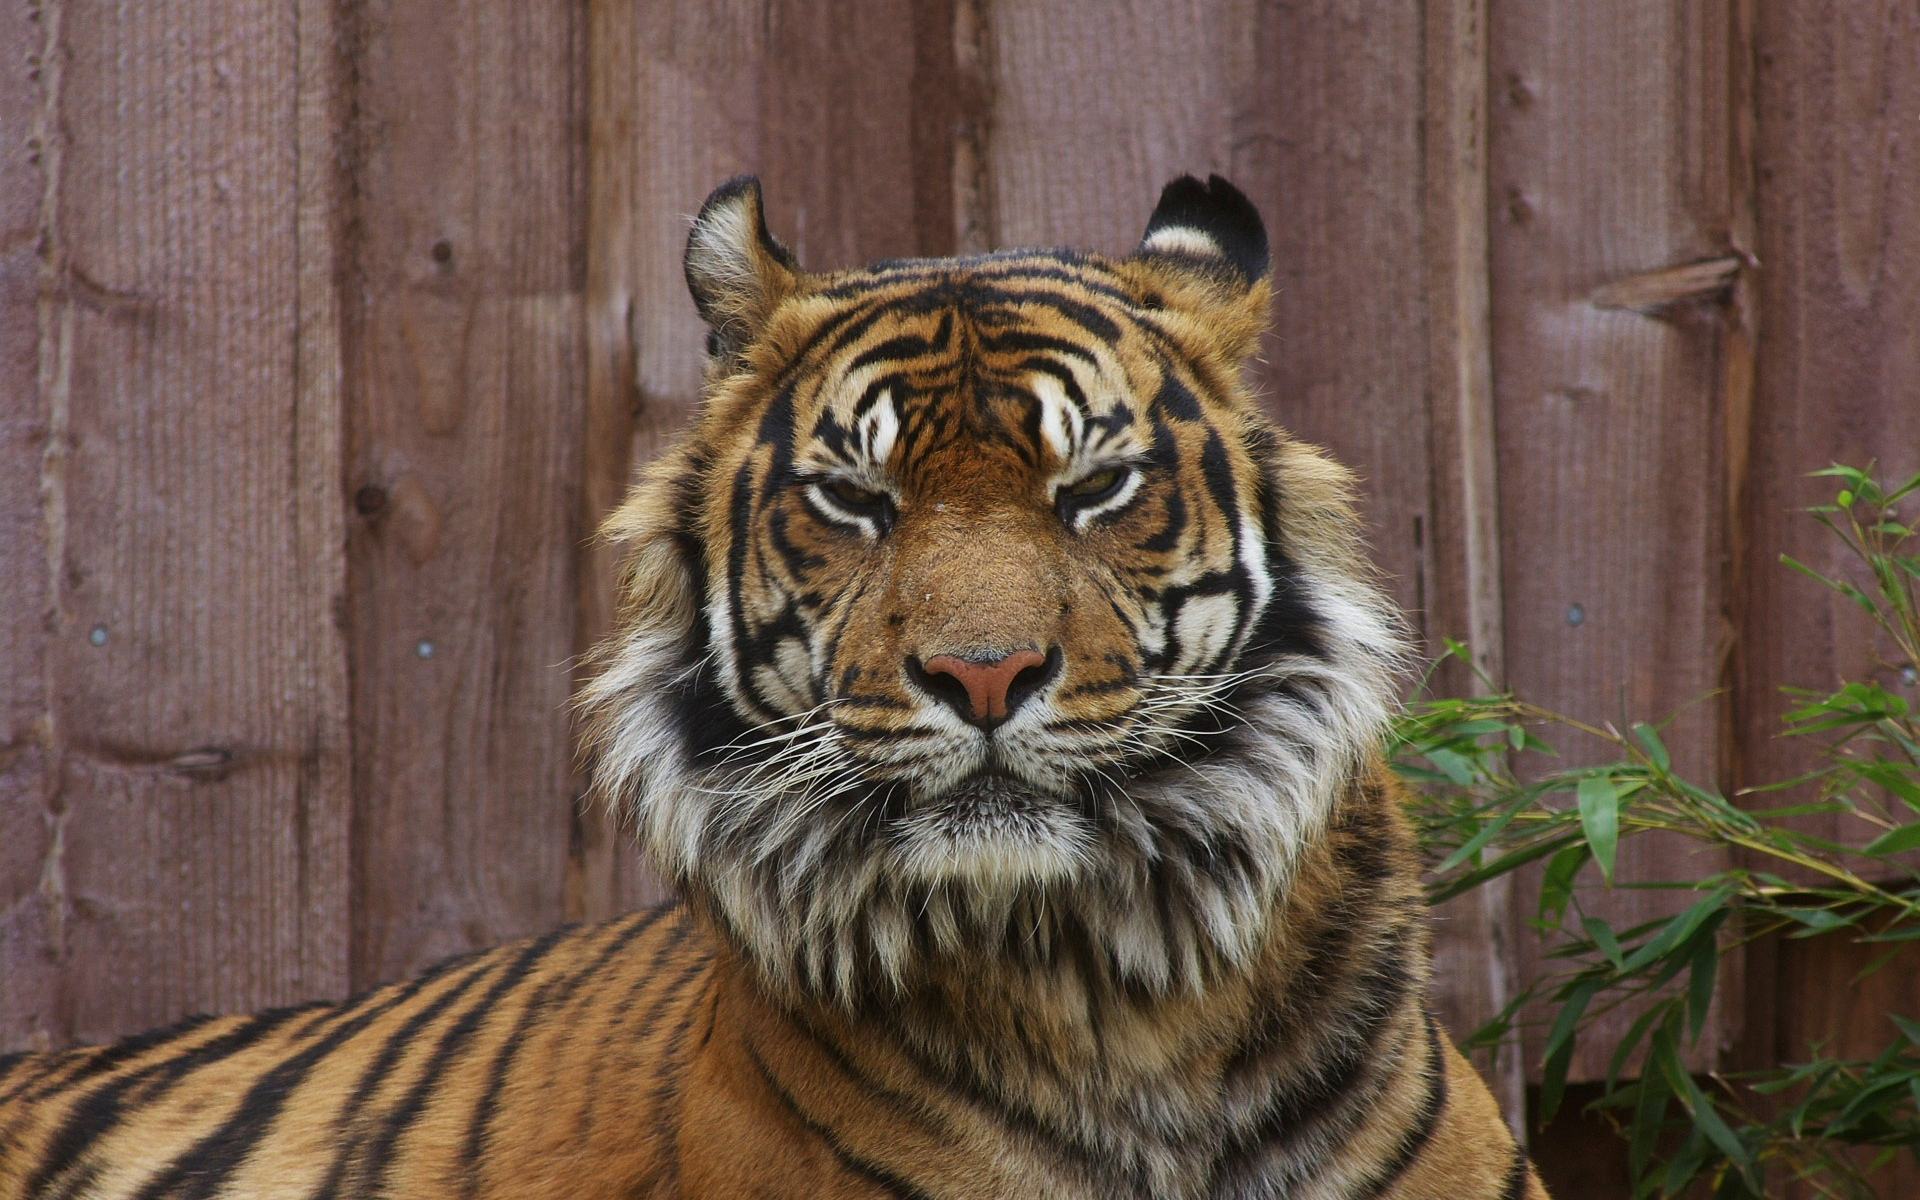 Tiger angry eyes